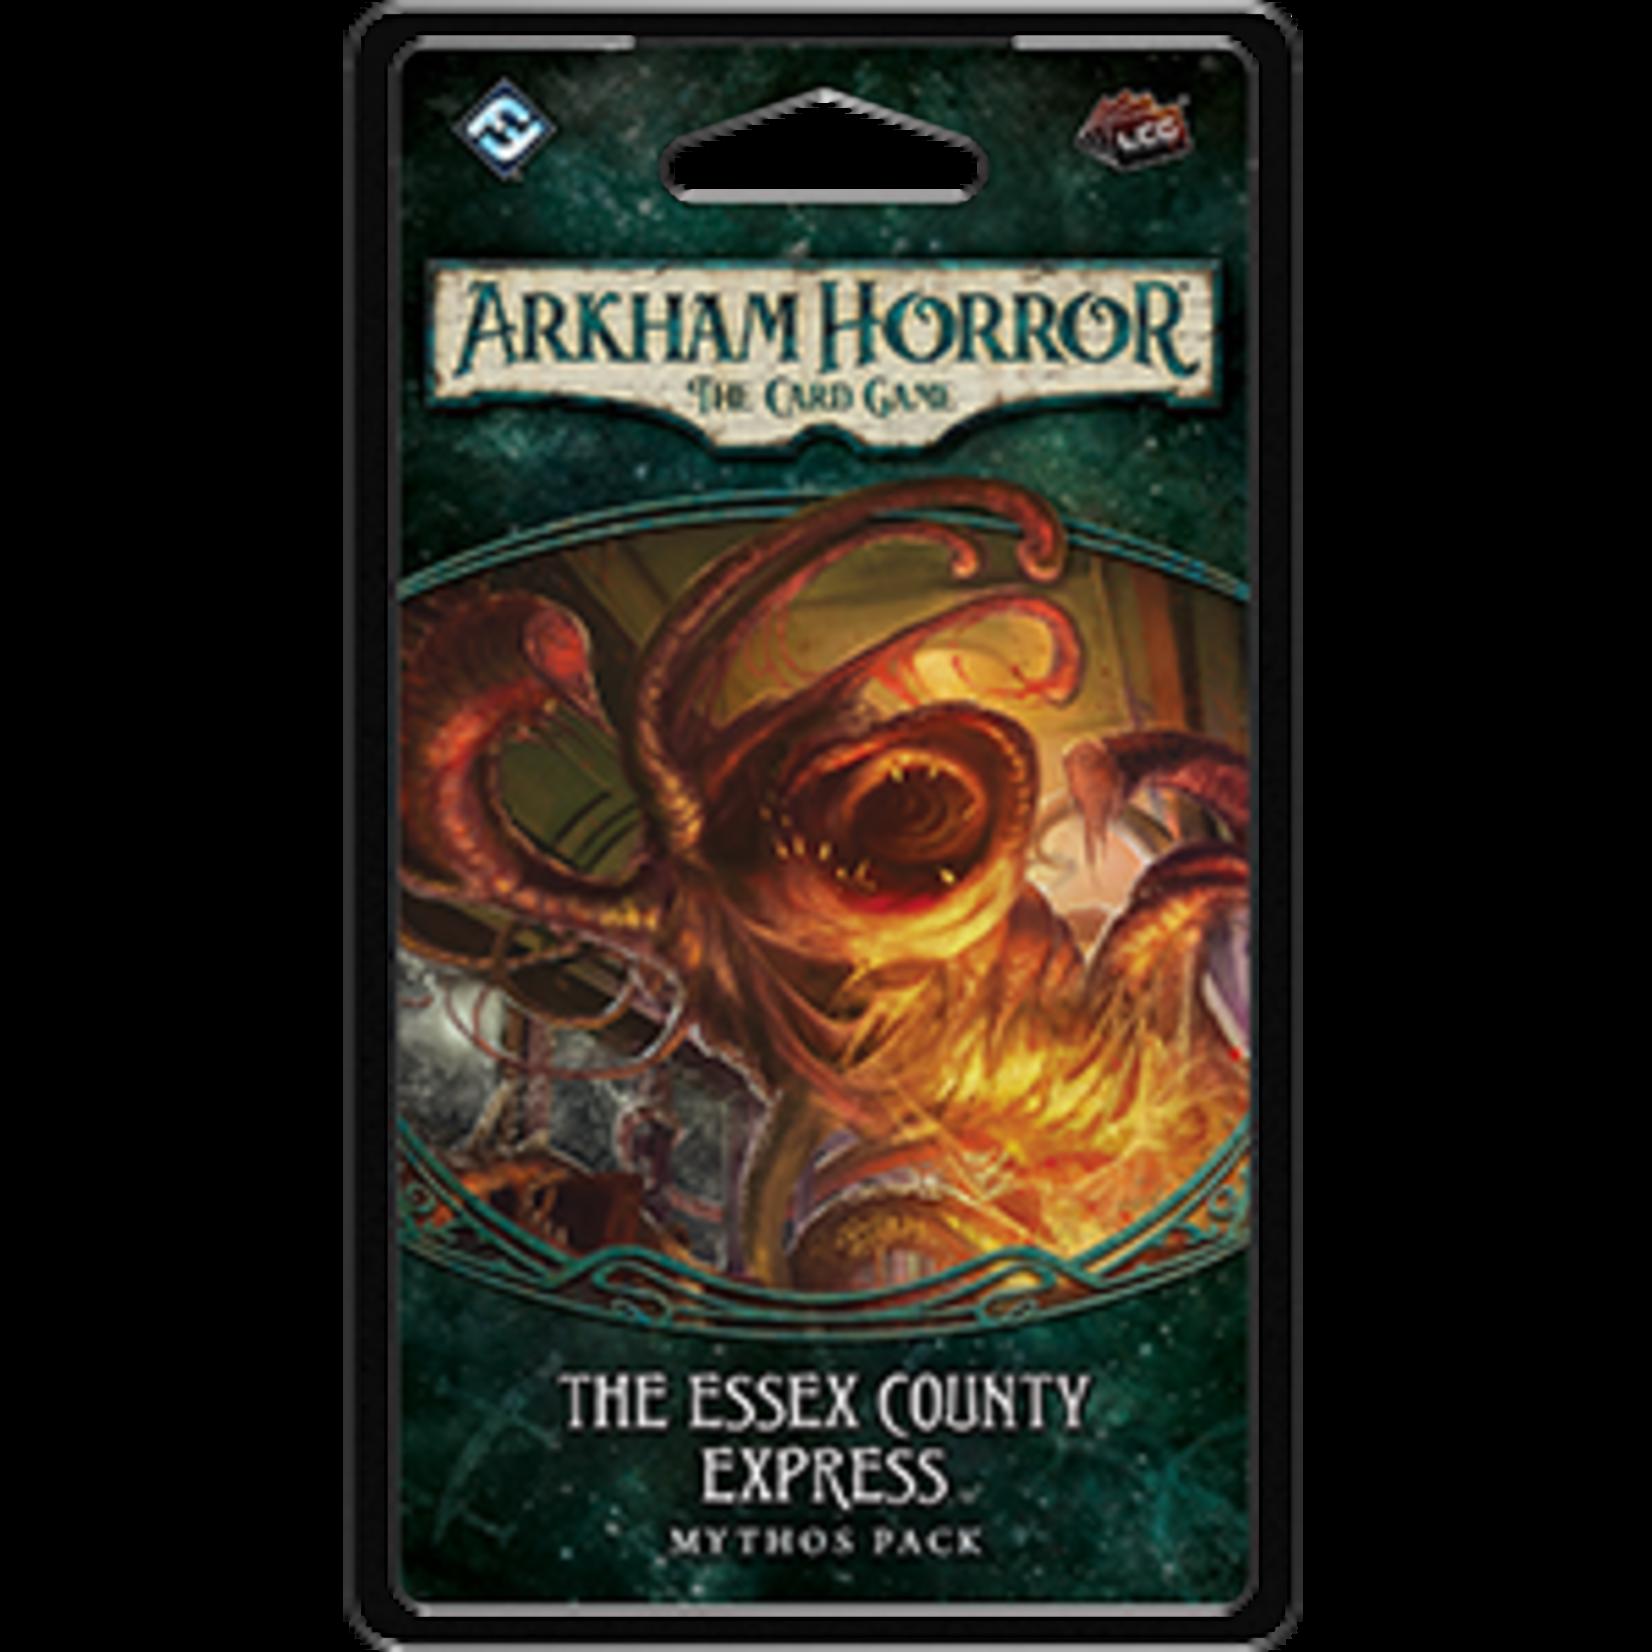 Fantasy Flight Games Arkham Horror LCG: The Essex County Express Mythos Pack (Dunwich Legacy Pack 2)